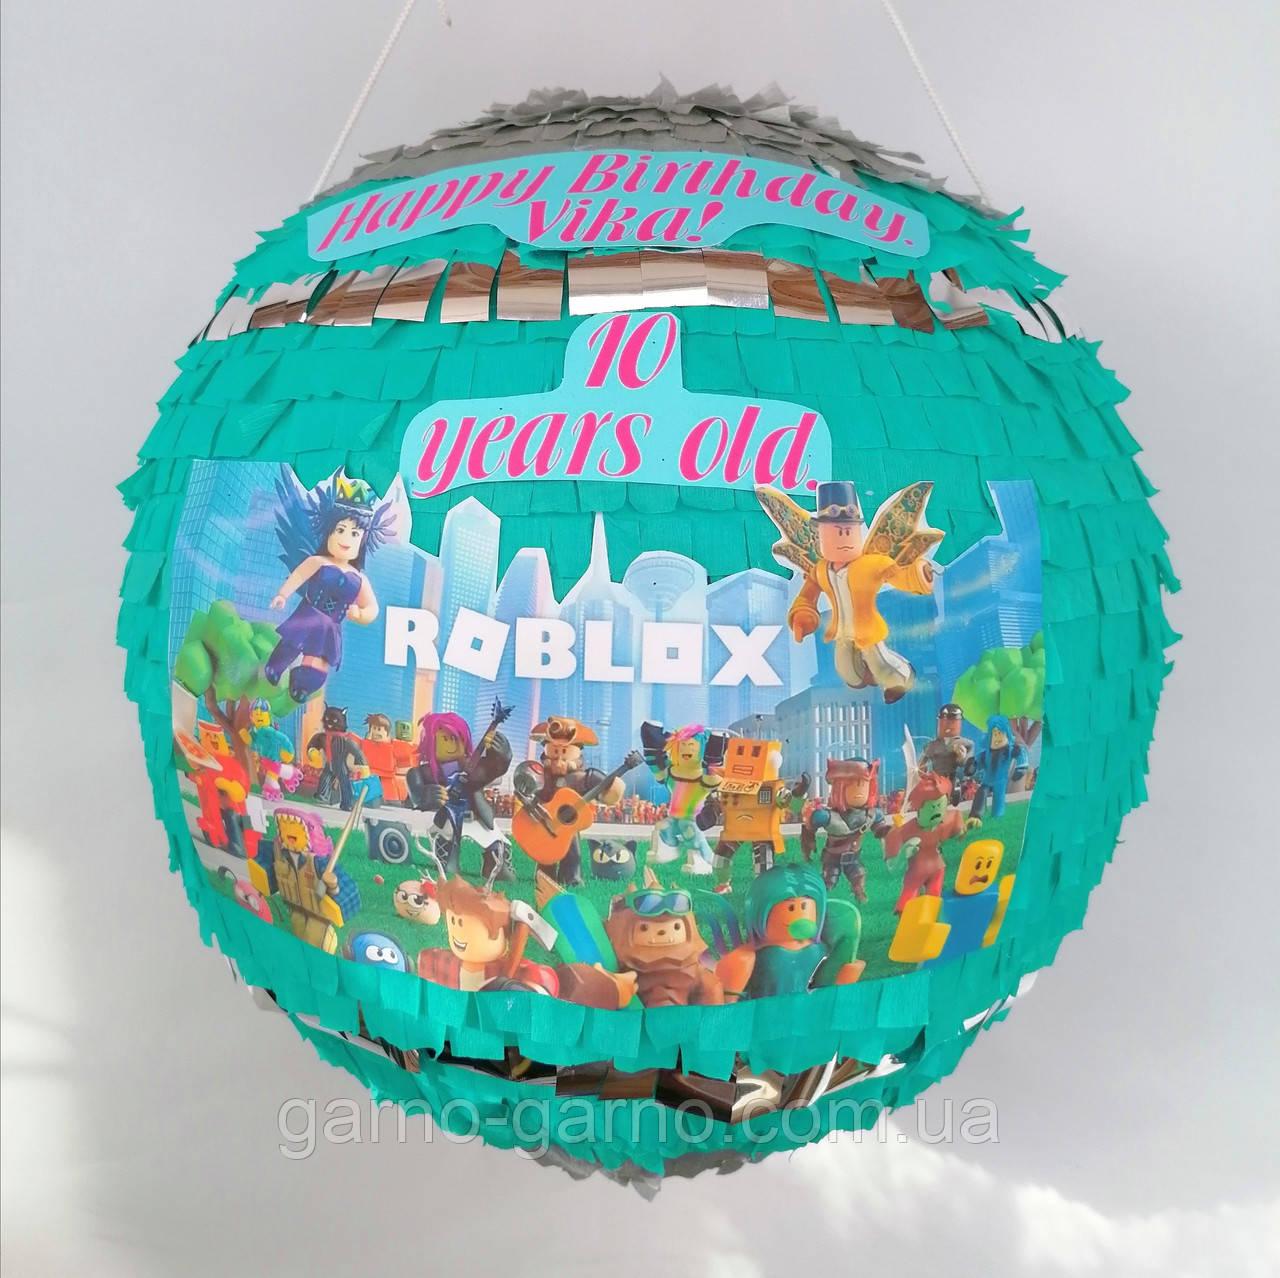 Пиньята roblox бумажная для праздника роблокс пиньята шар обхват 88-90см